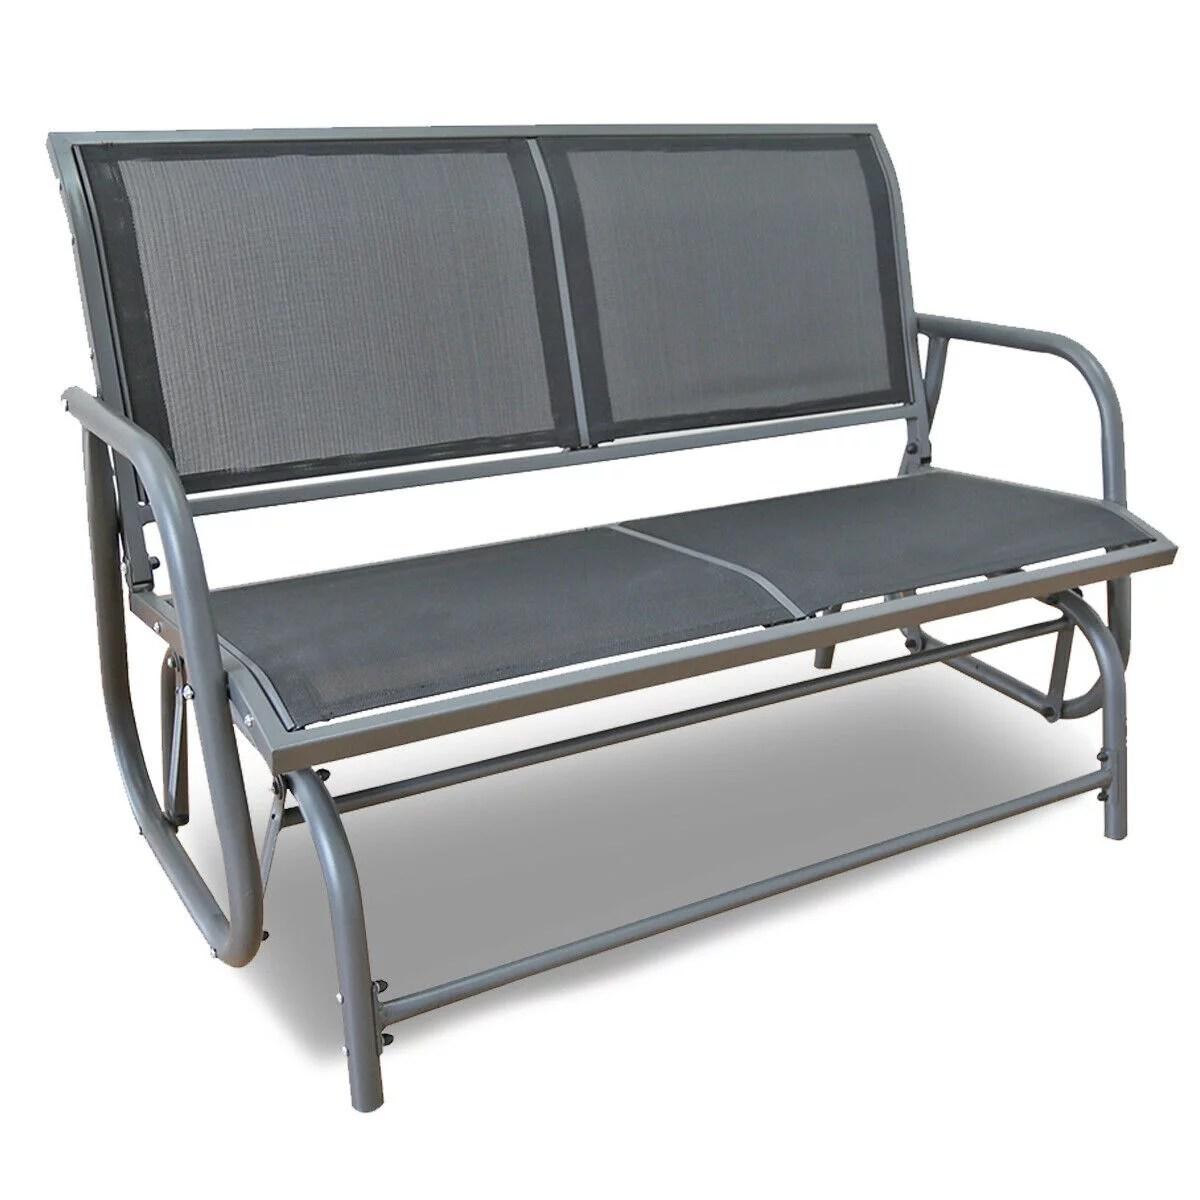 outdoor patio swing glider bench chair dark gray